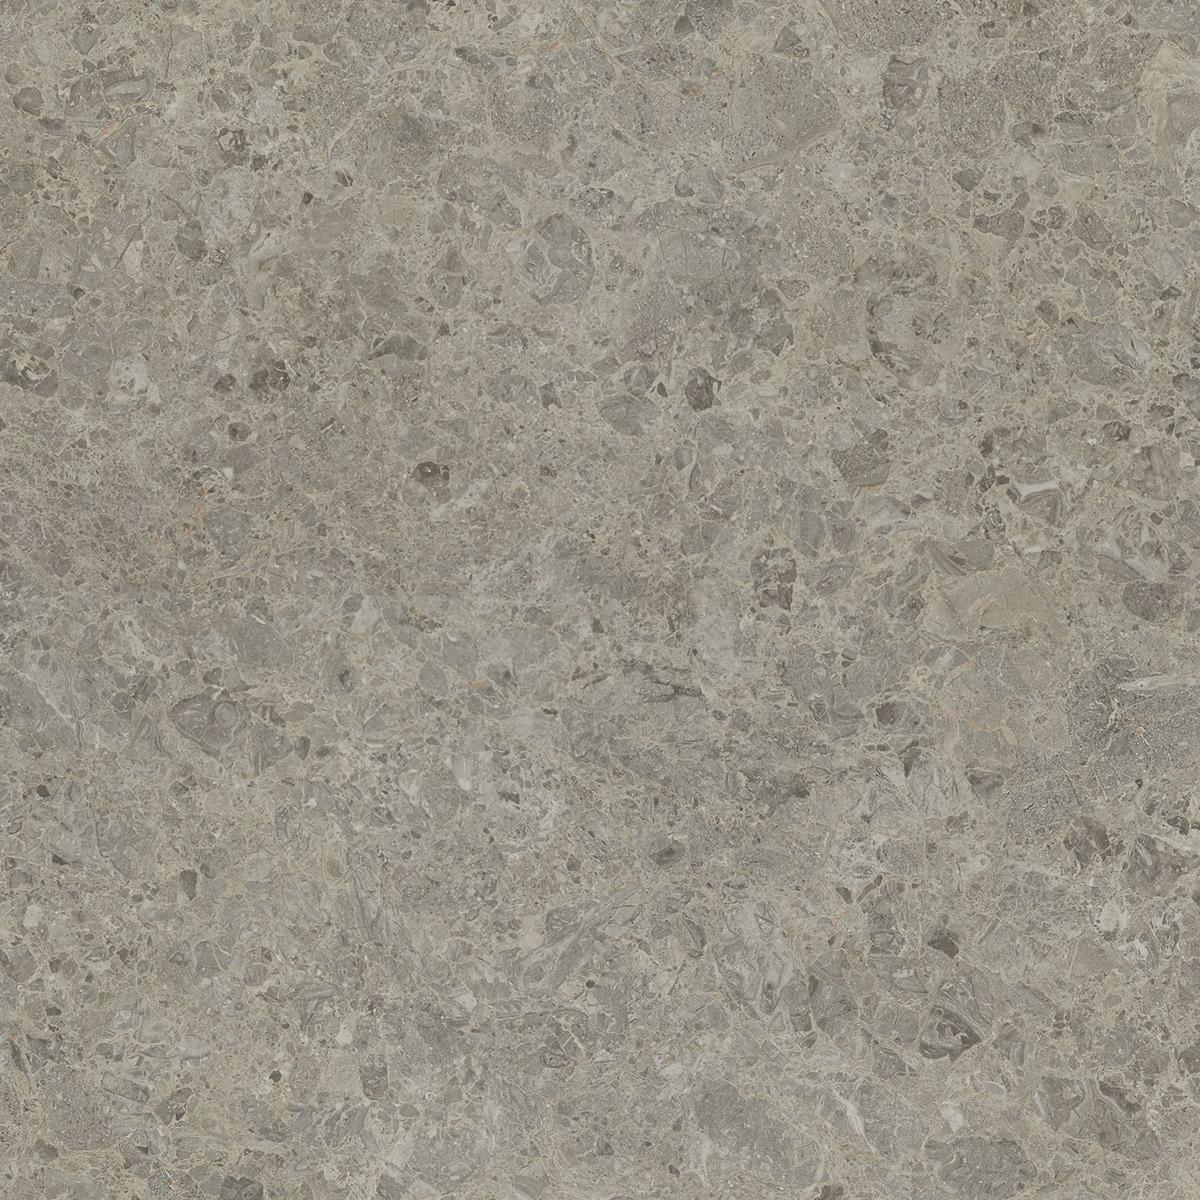 9307 Silver Shalestone - Formica